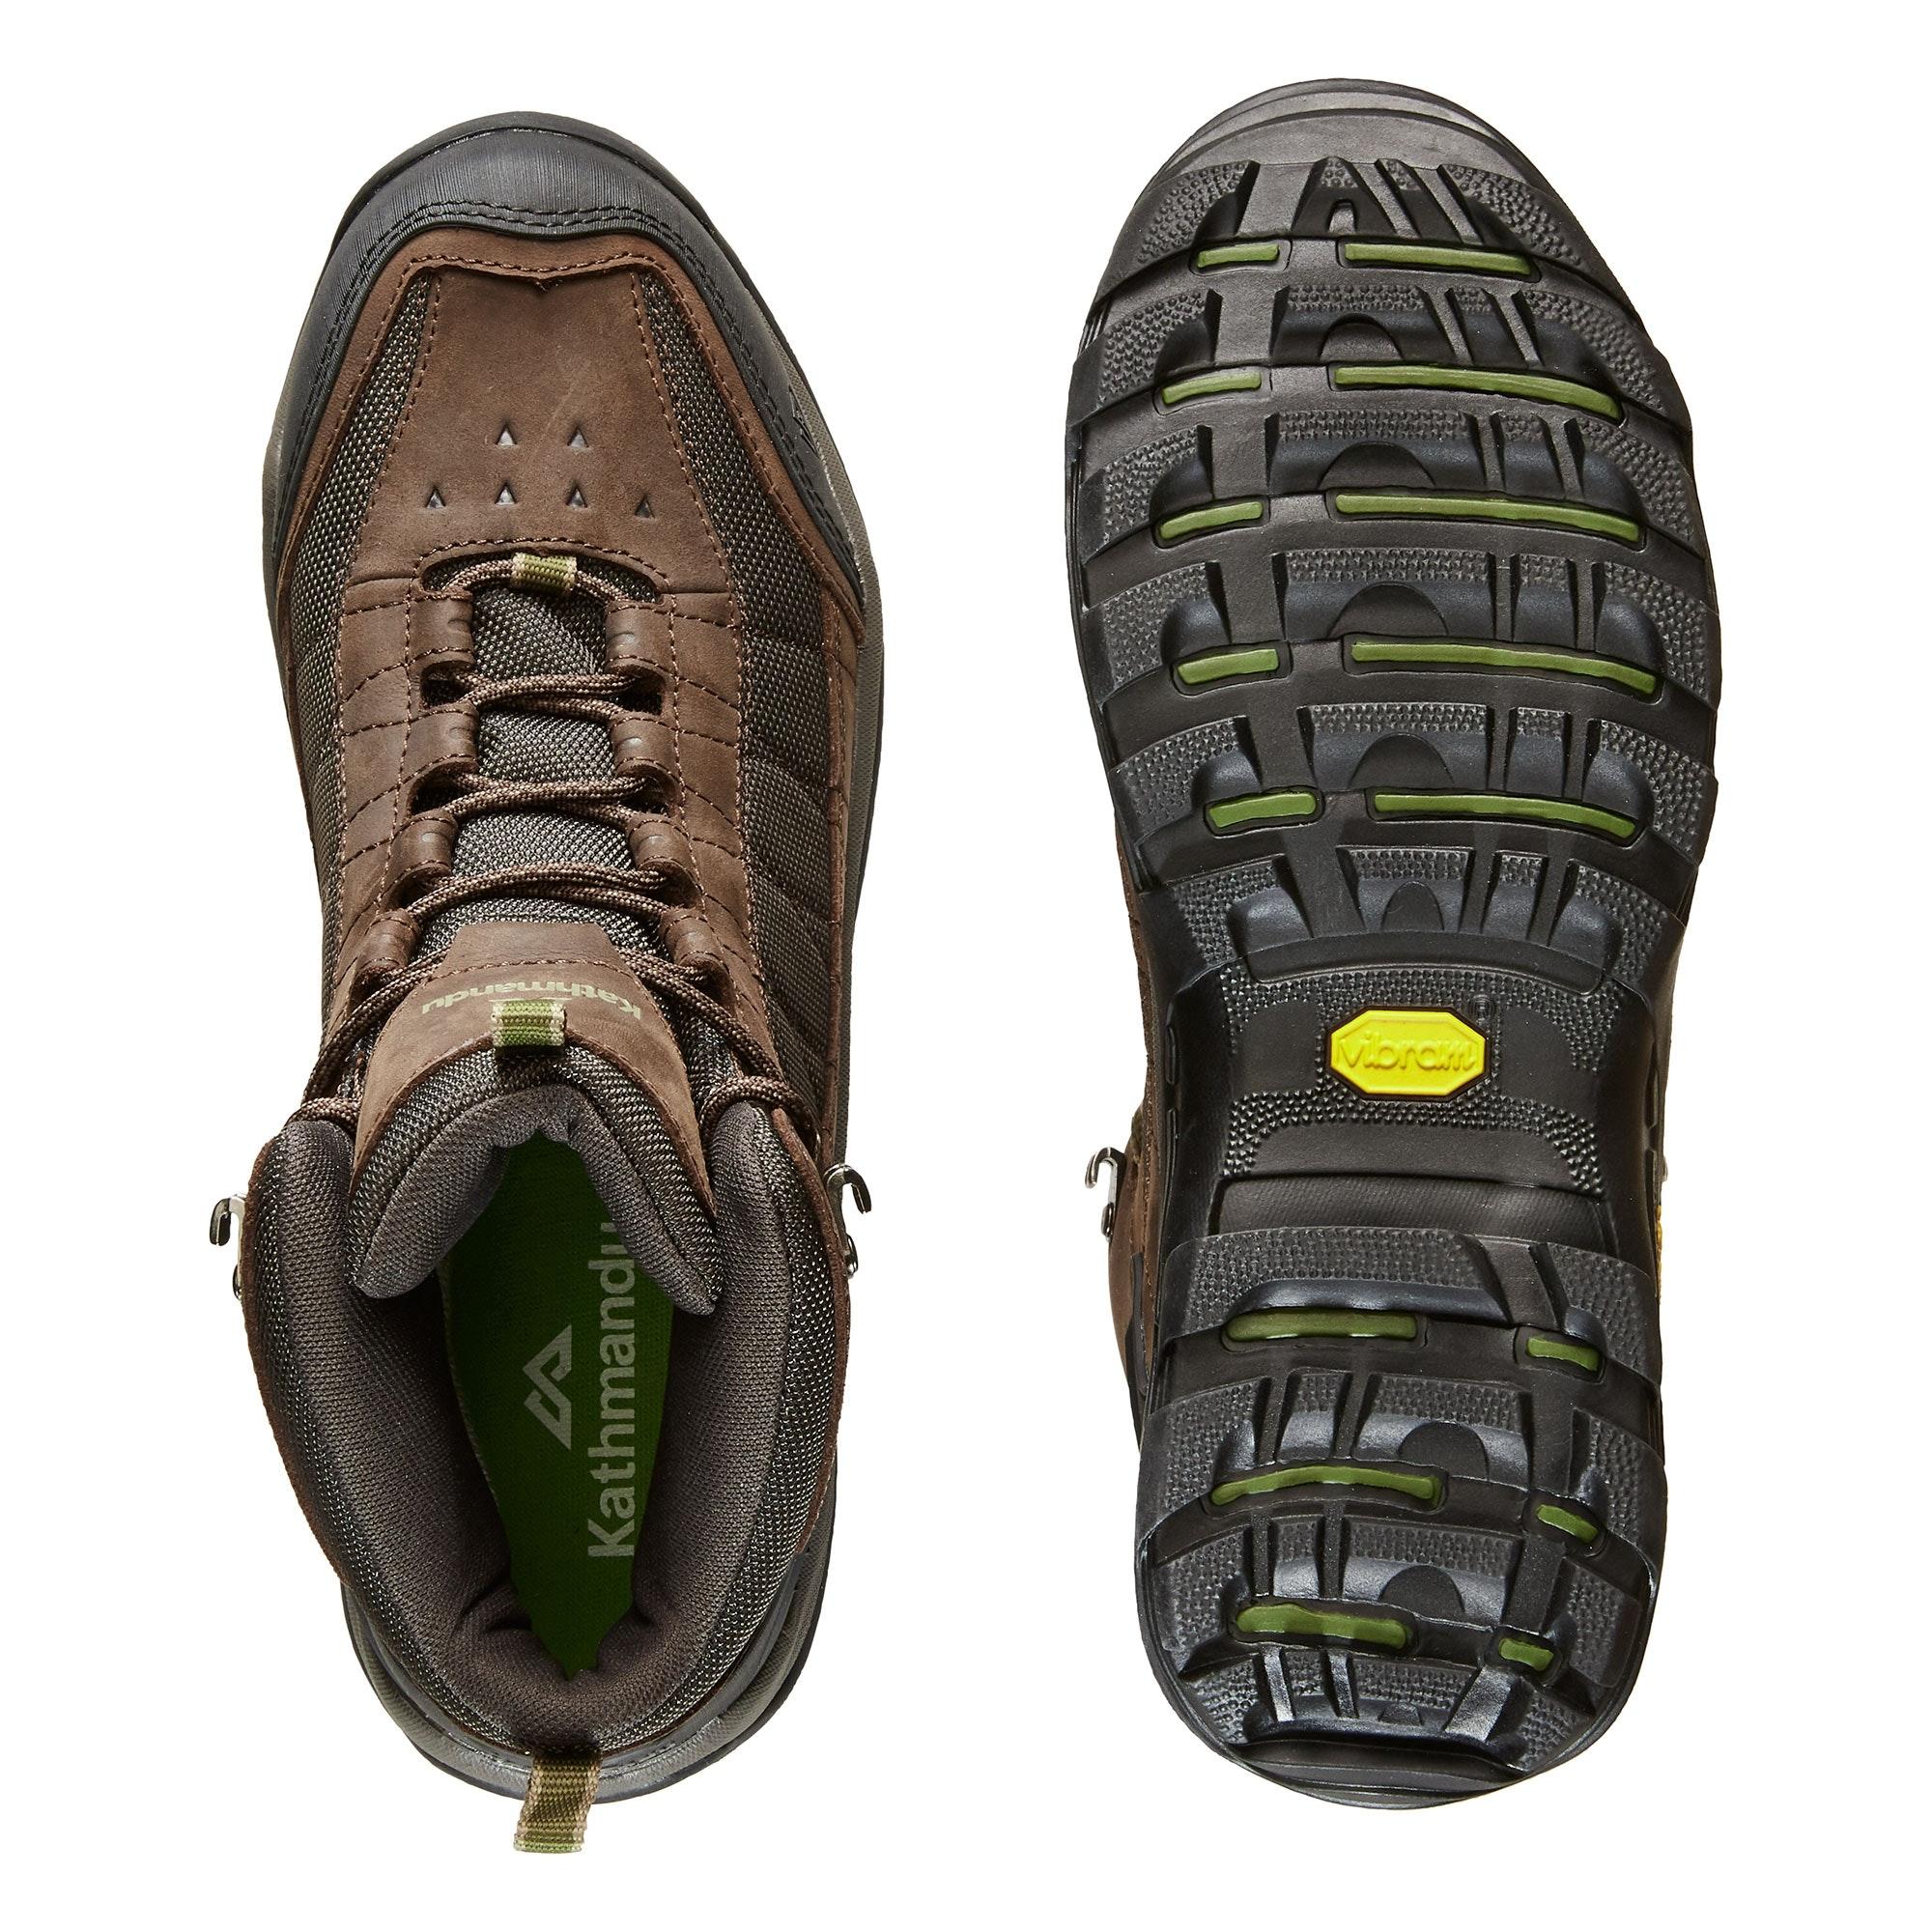 NEW-Kathmandu-Mornington-Mens-Vibram-Rubber-Waterproof-Lightweight-Hiking-Boots thumbnail 6